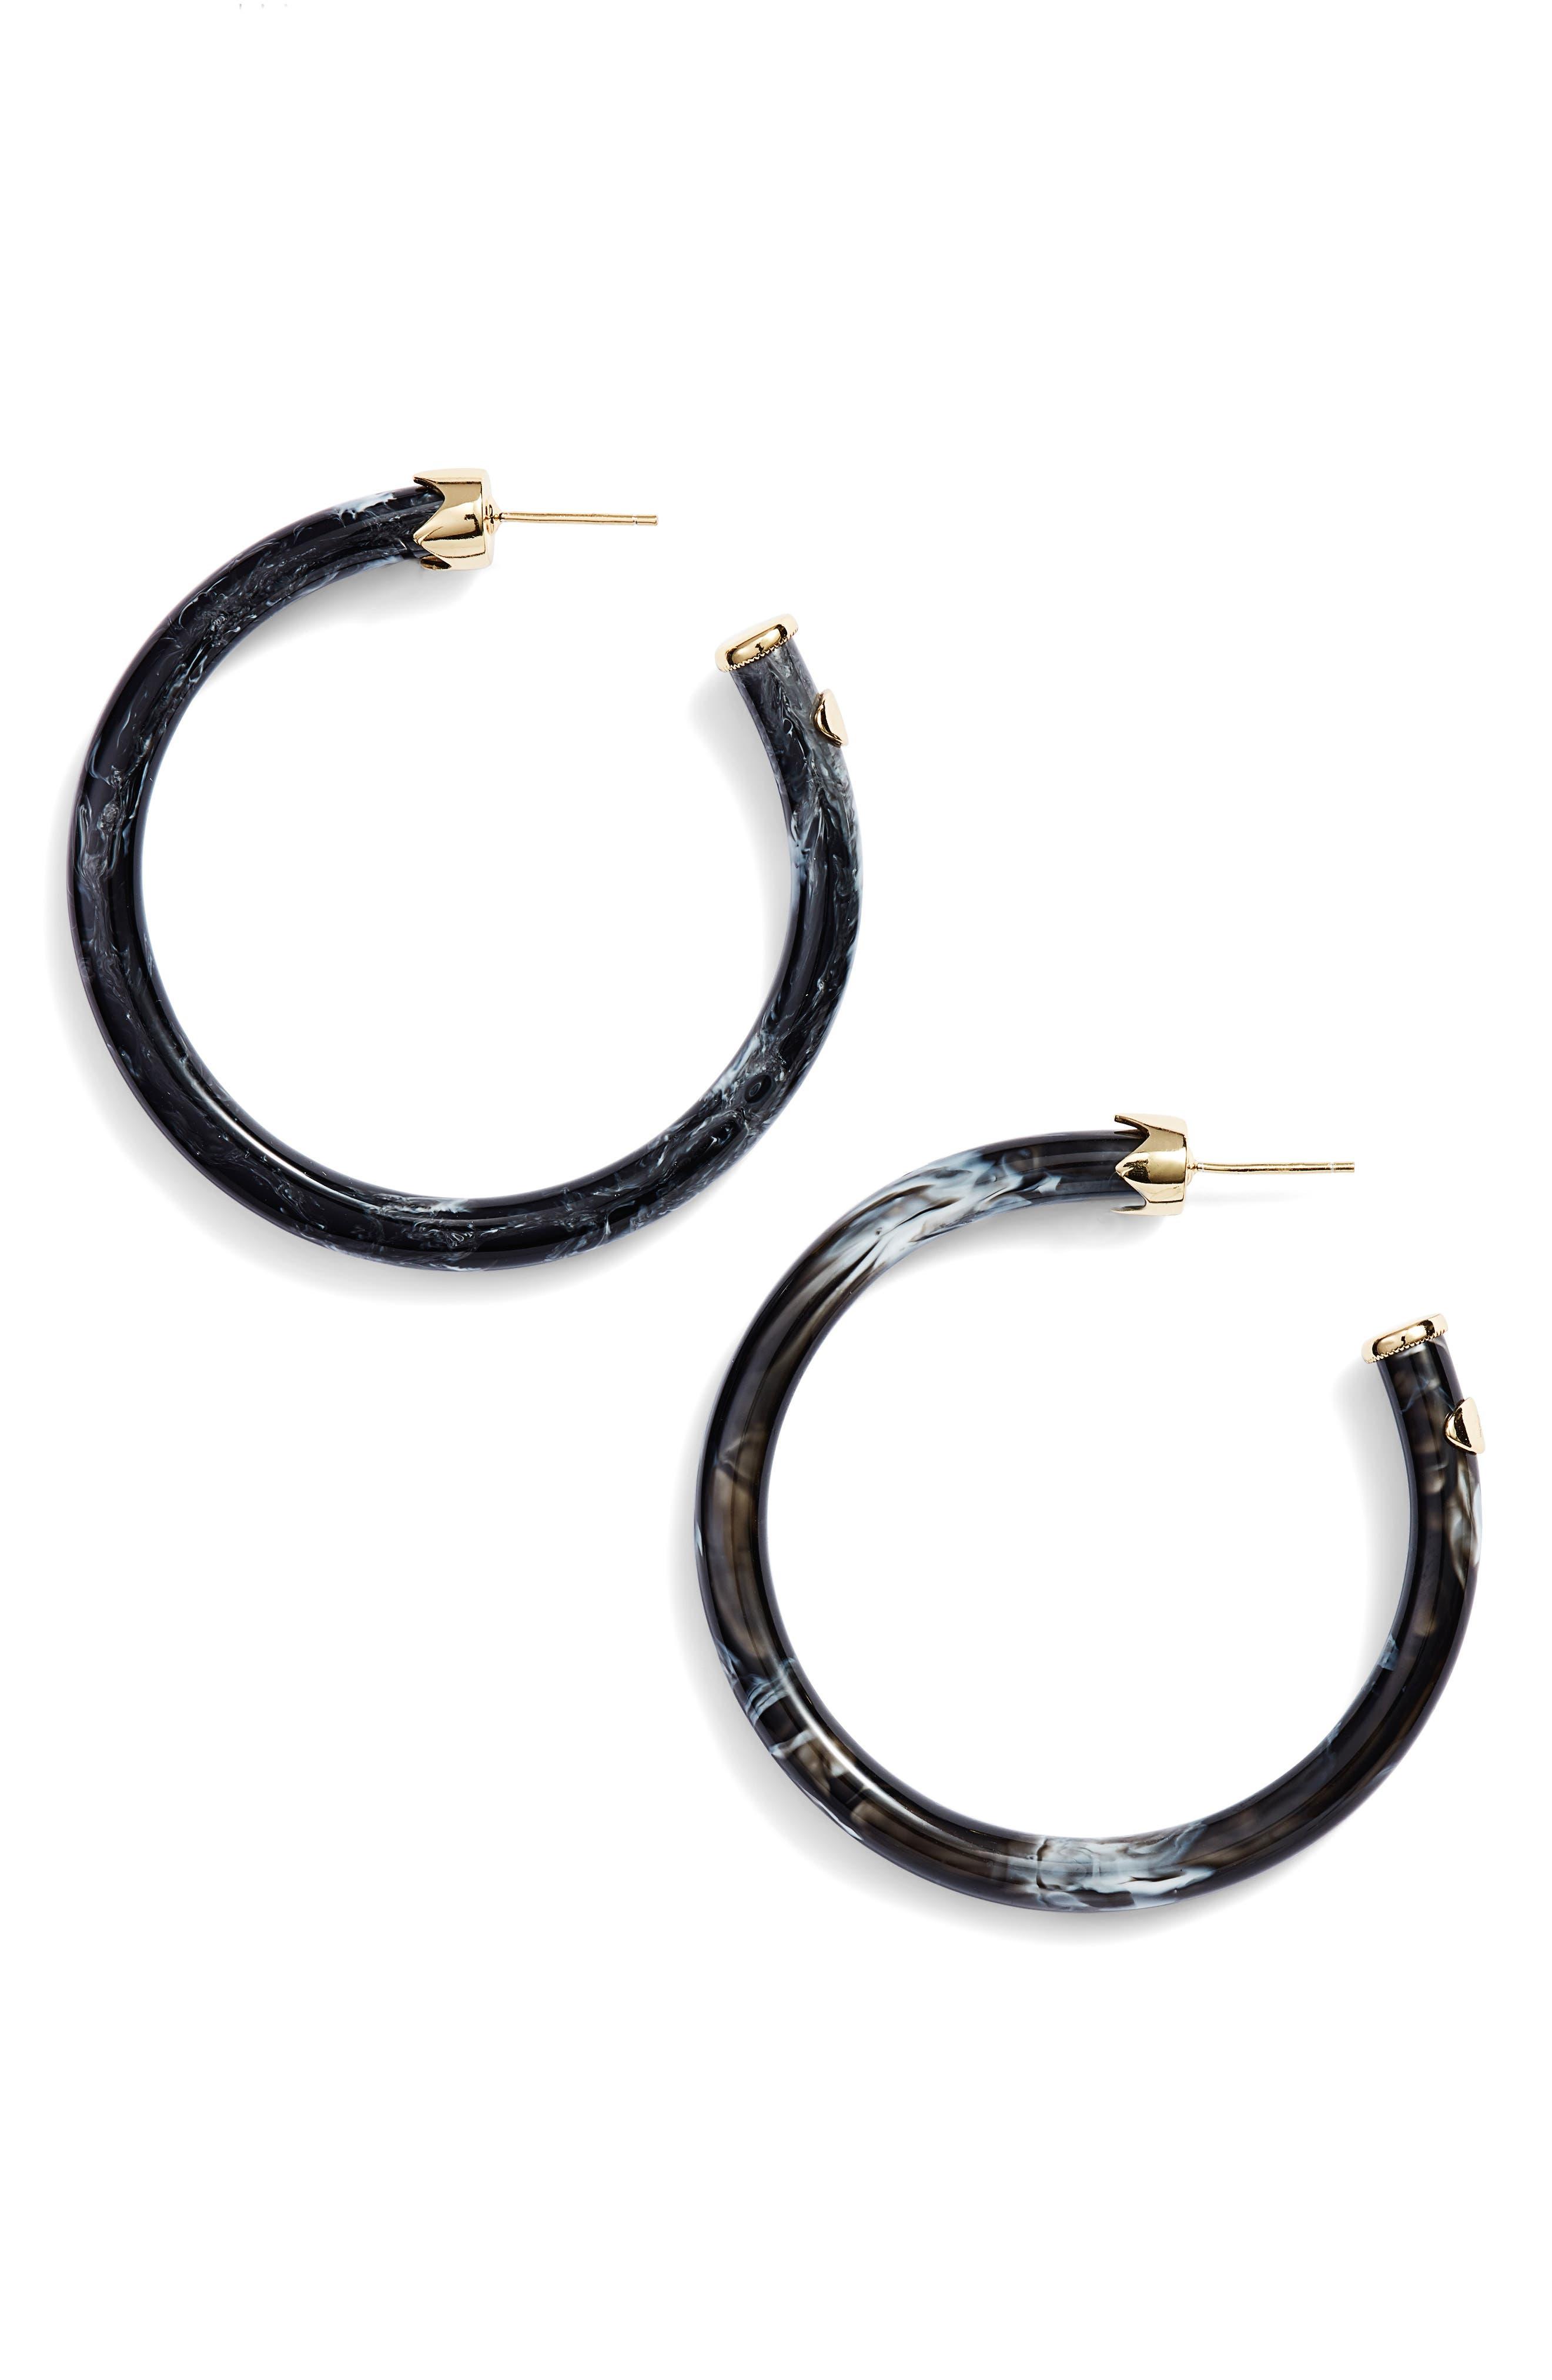 Marbleized Hoop Earrings,                             Main thumbnail 1, color,                             Gold/ Black